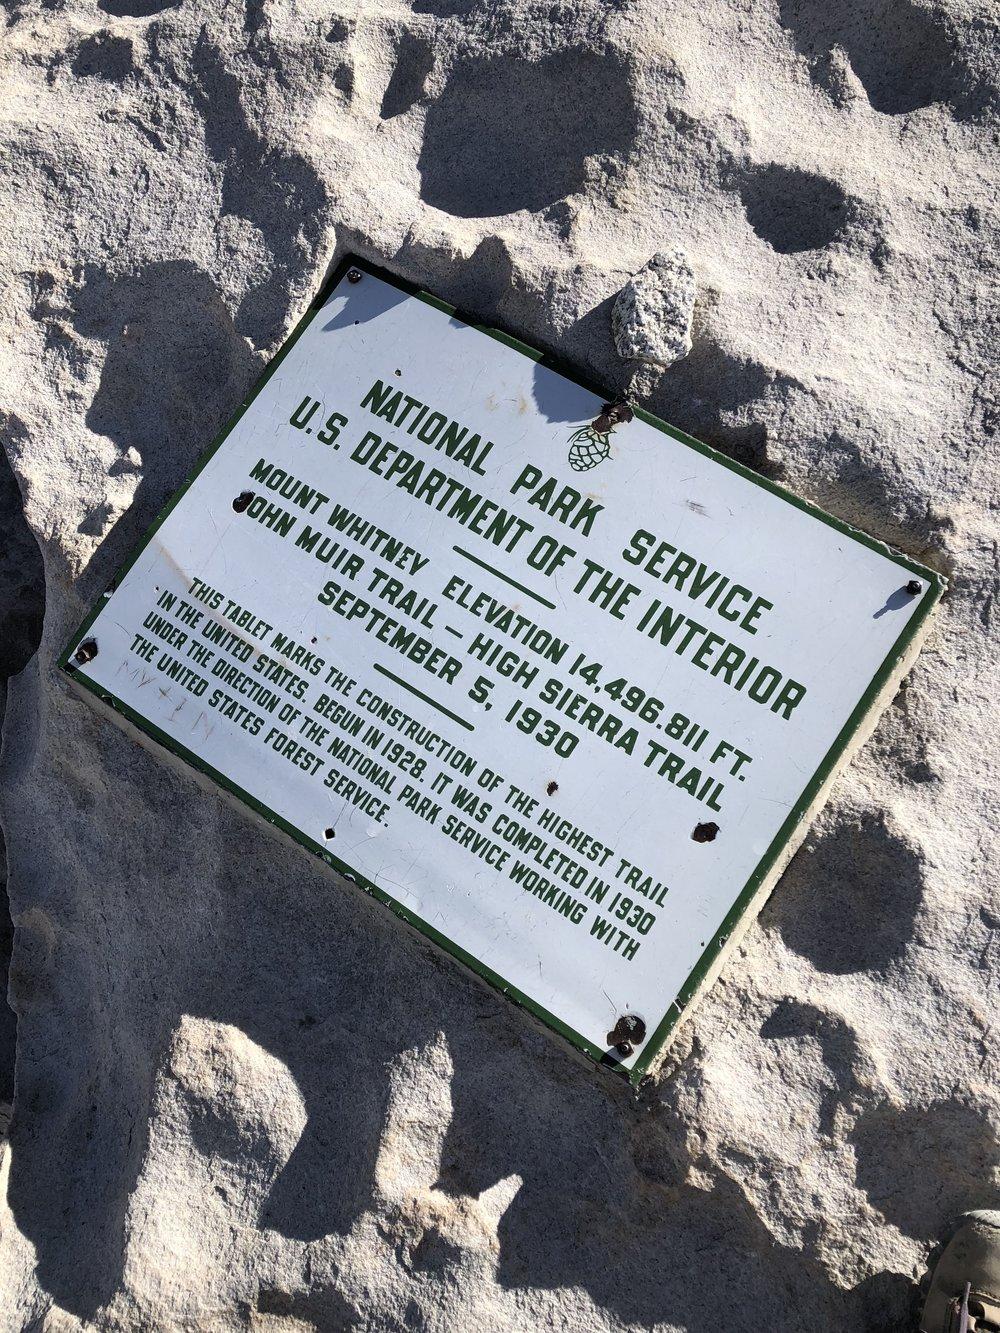 mt whitney summit sign.JPG